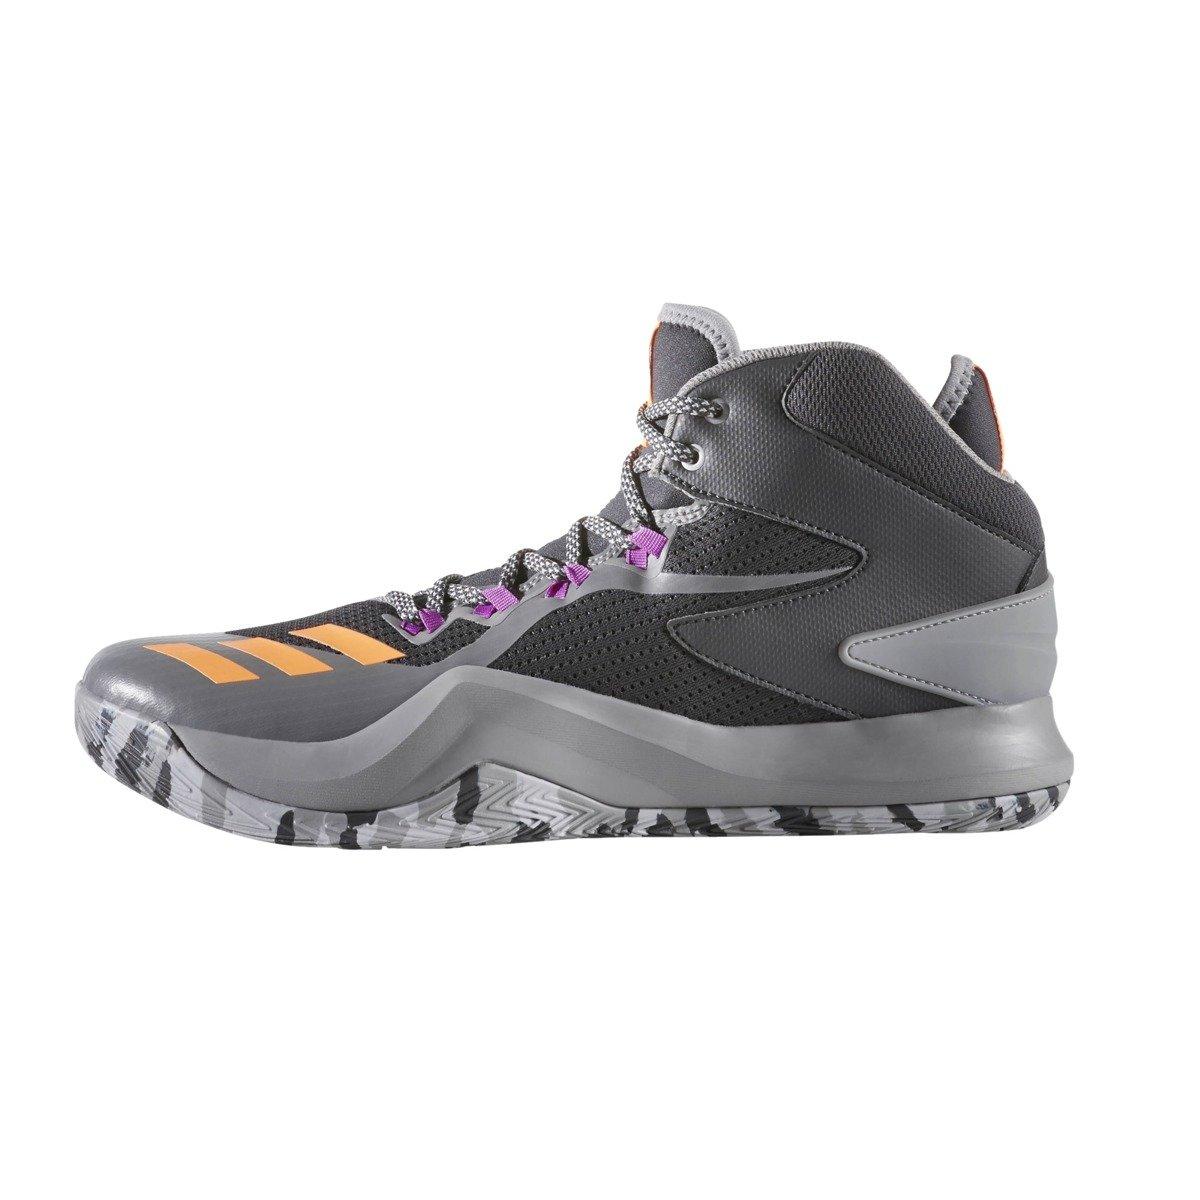 e9b44d02106a ... Adidas D Rose Dominate 4 Shoes - BB8180 ...